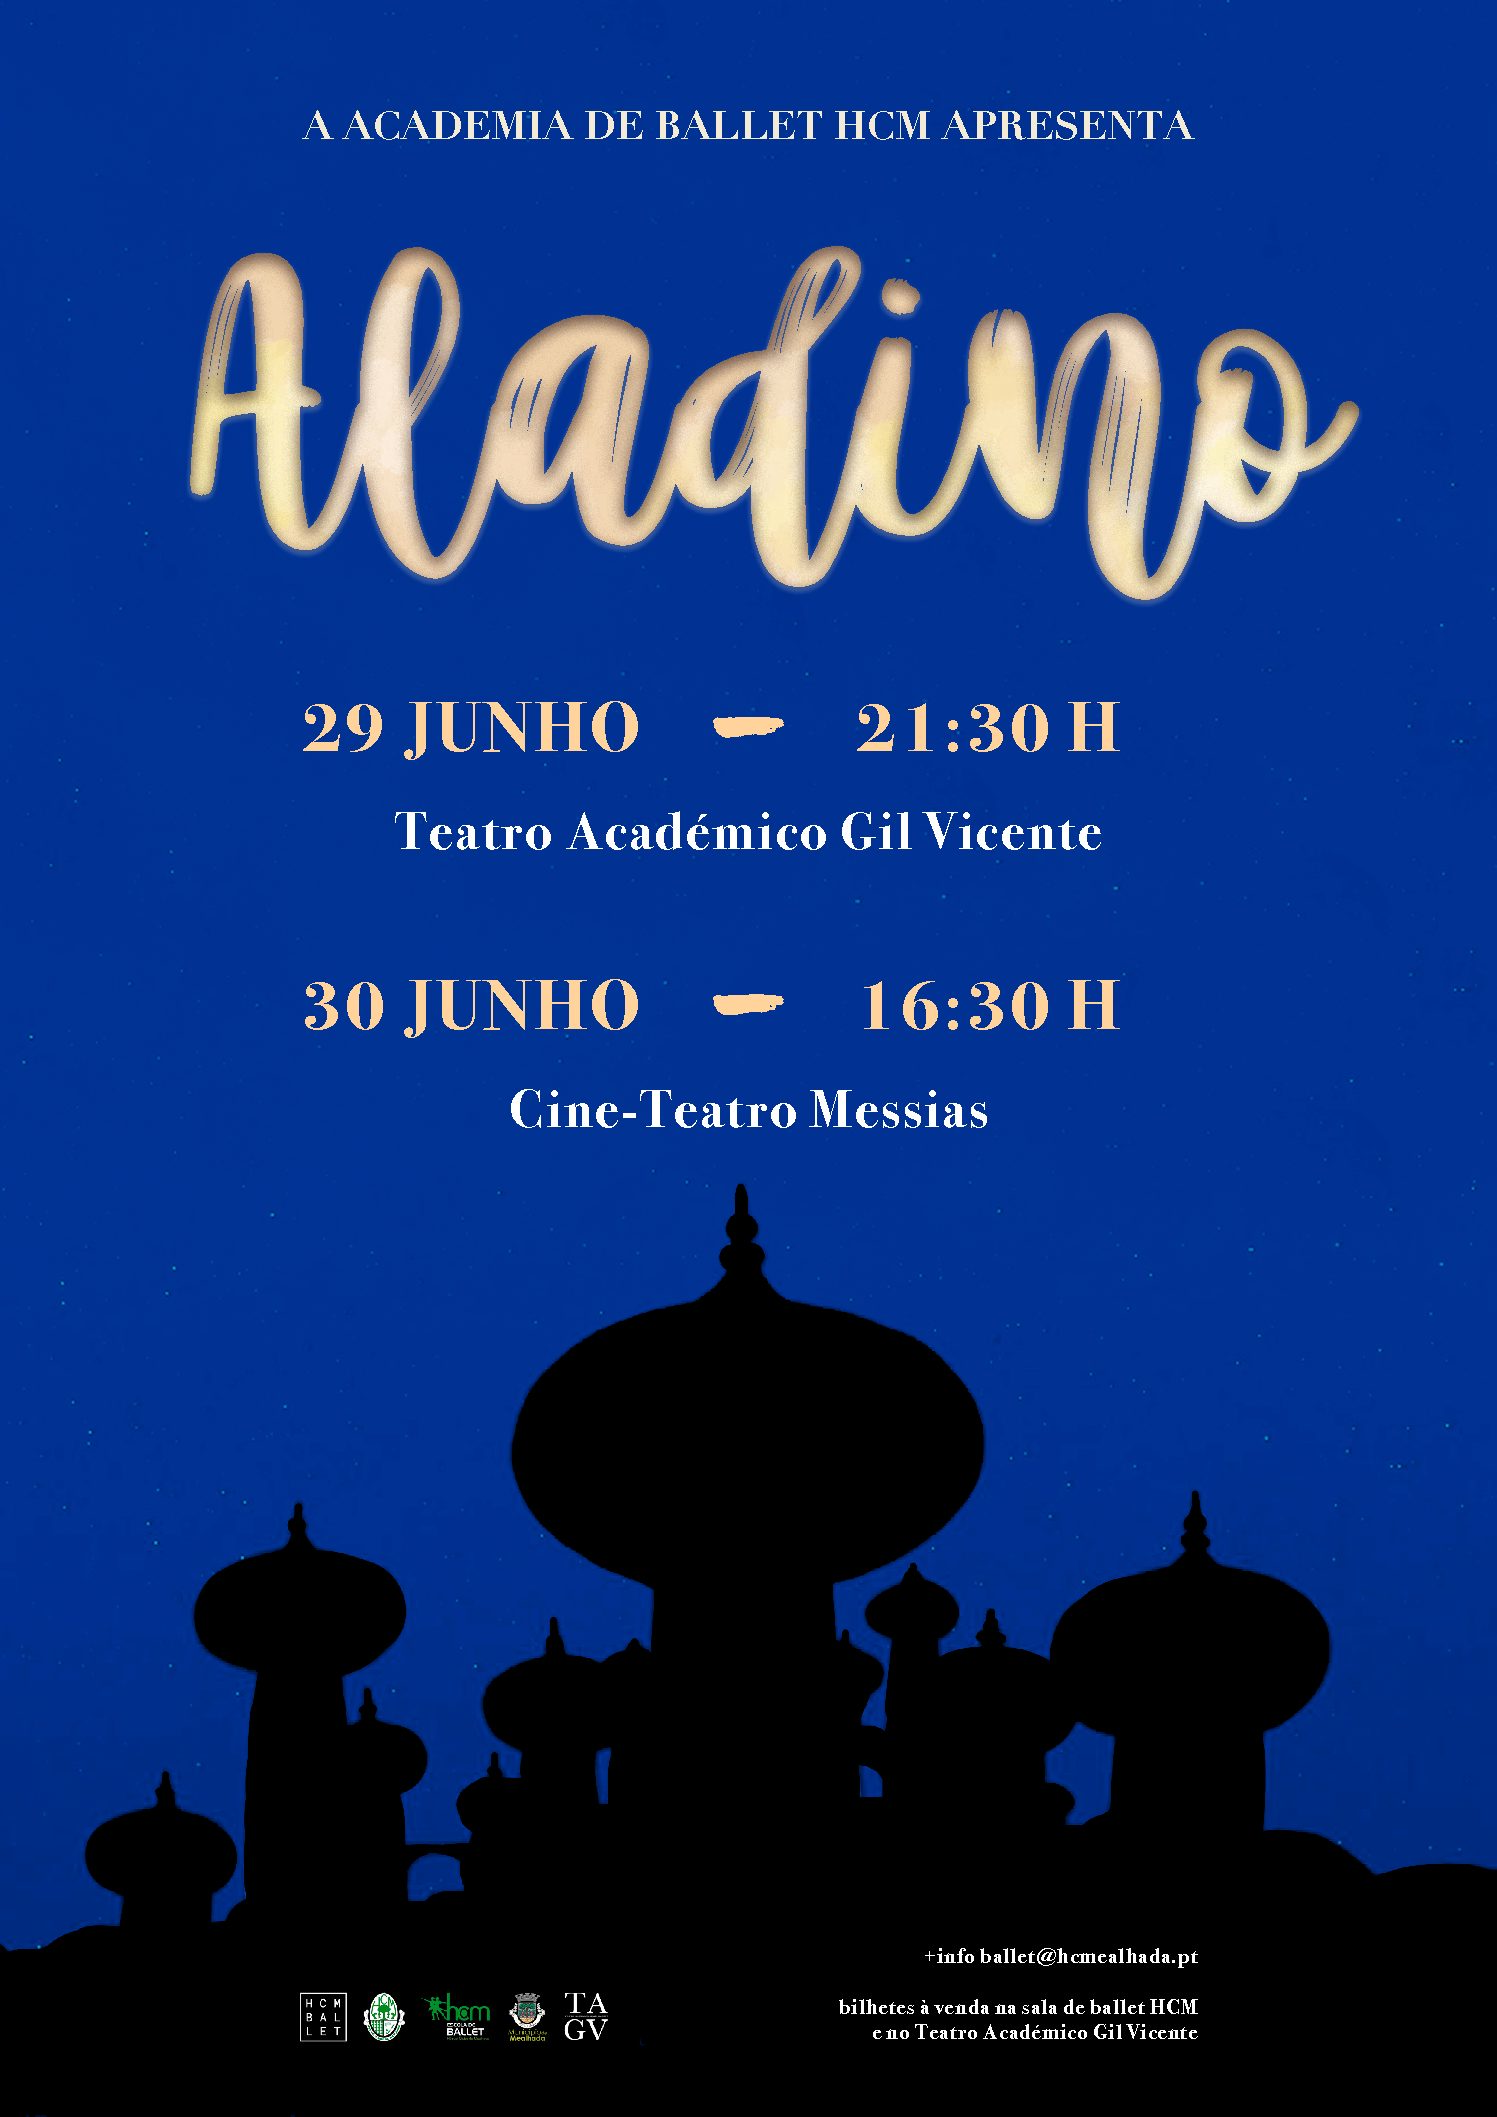 Ballet do HCM apresenta nos dias 29 e 30 de Junho o espectáculo Aladino